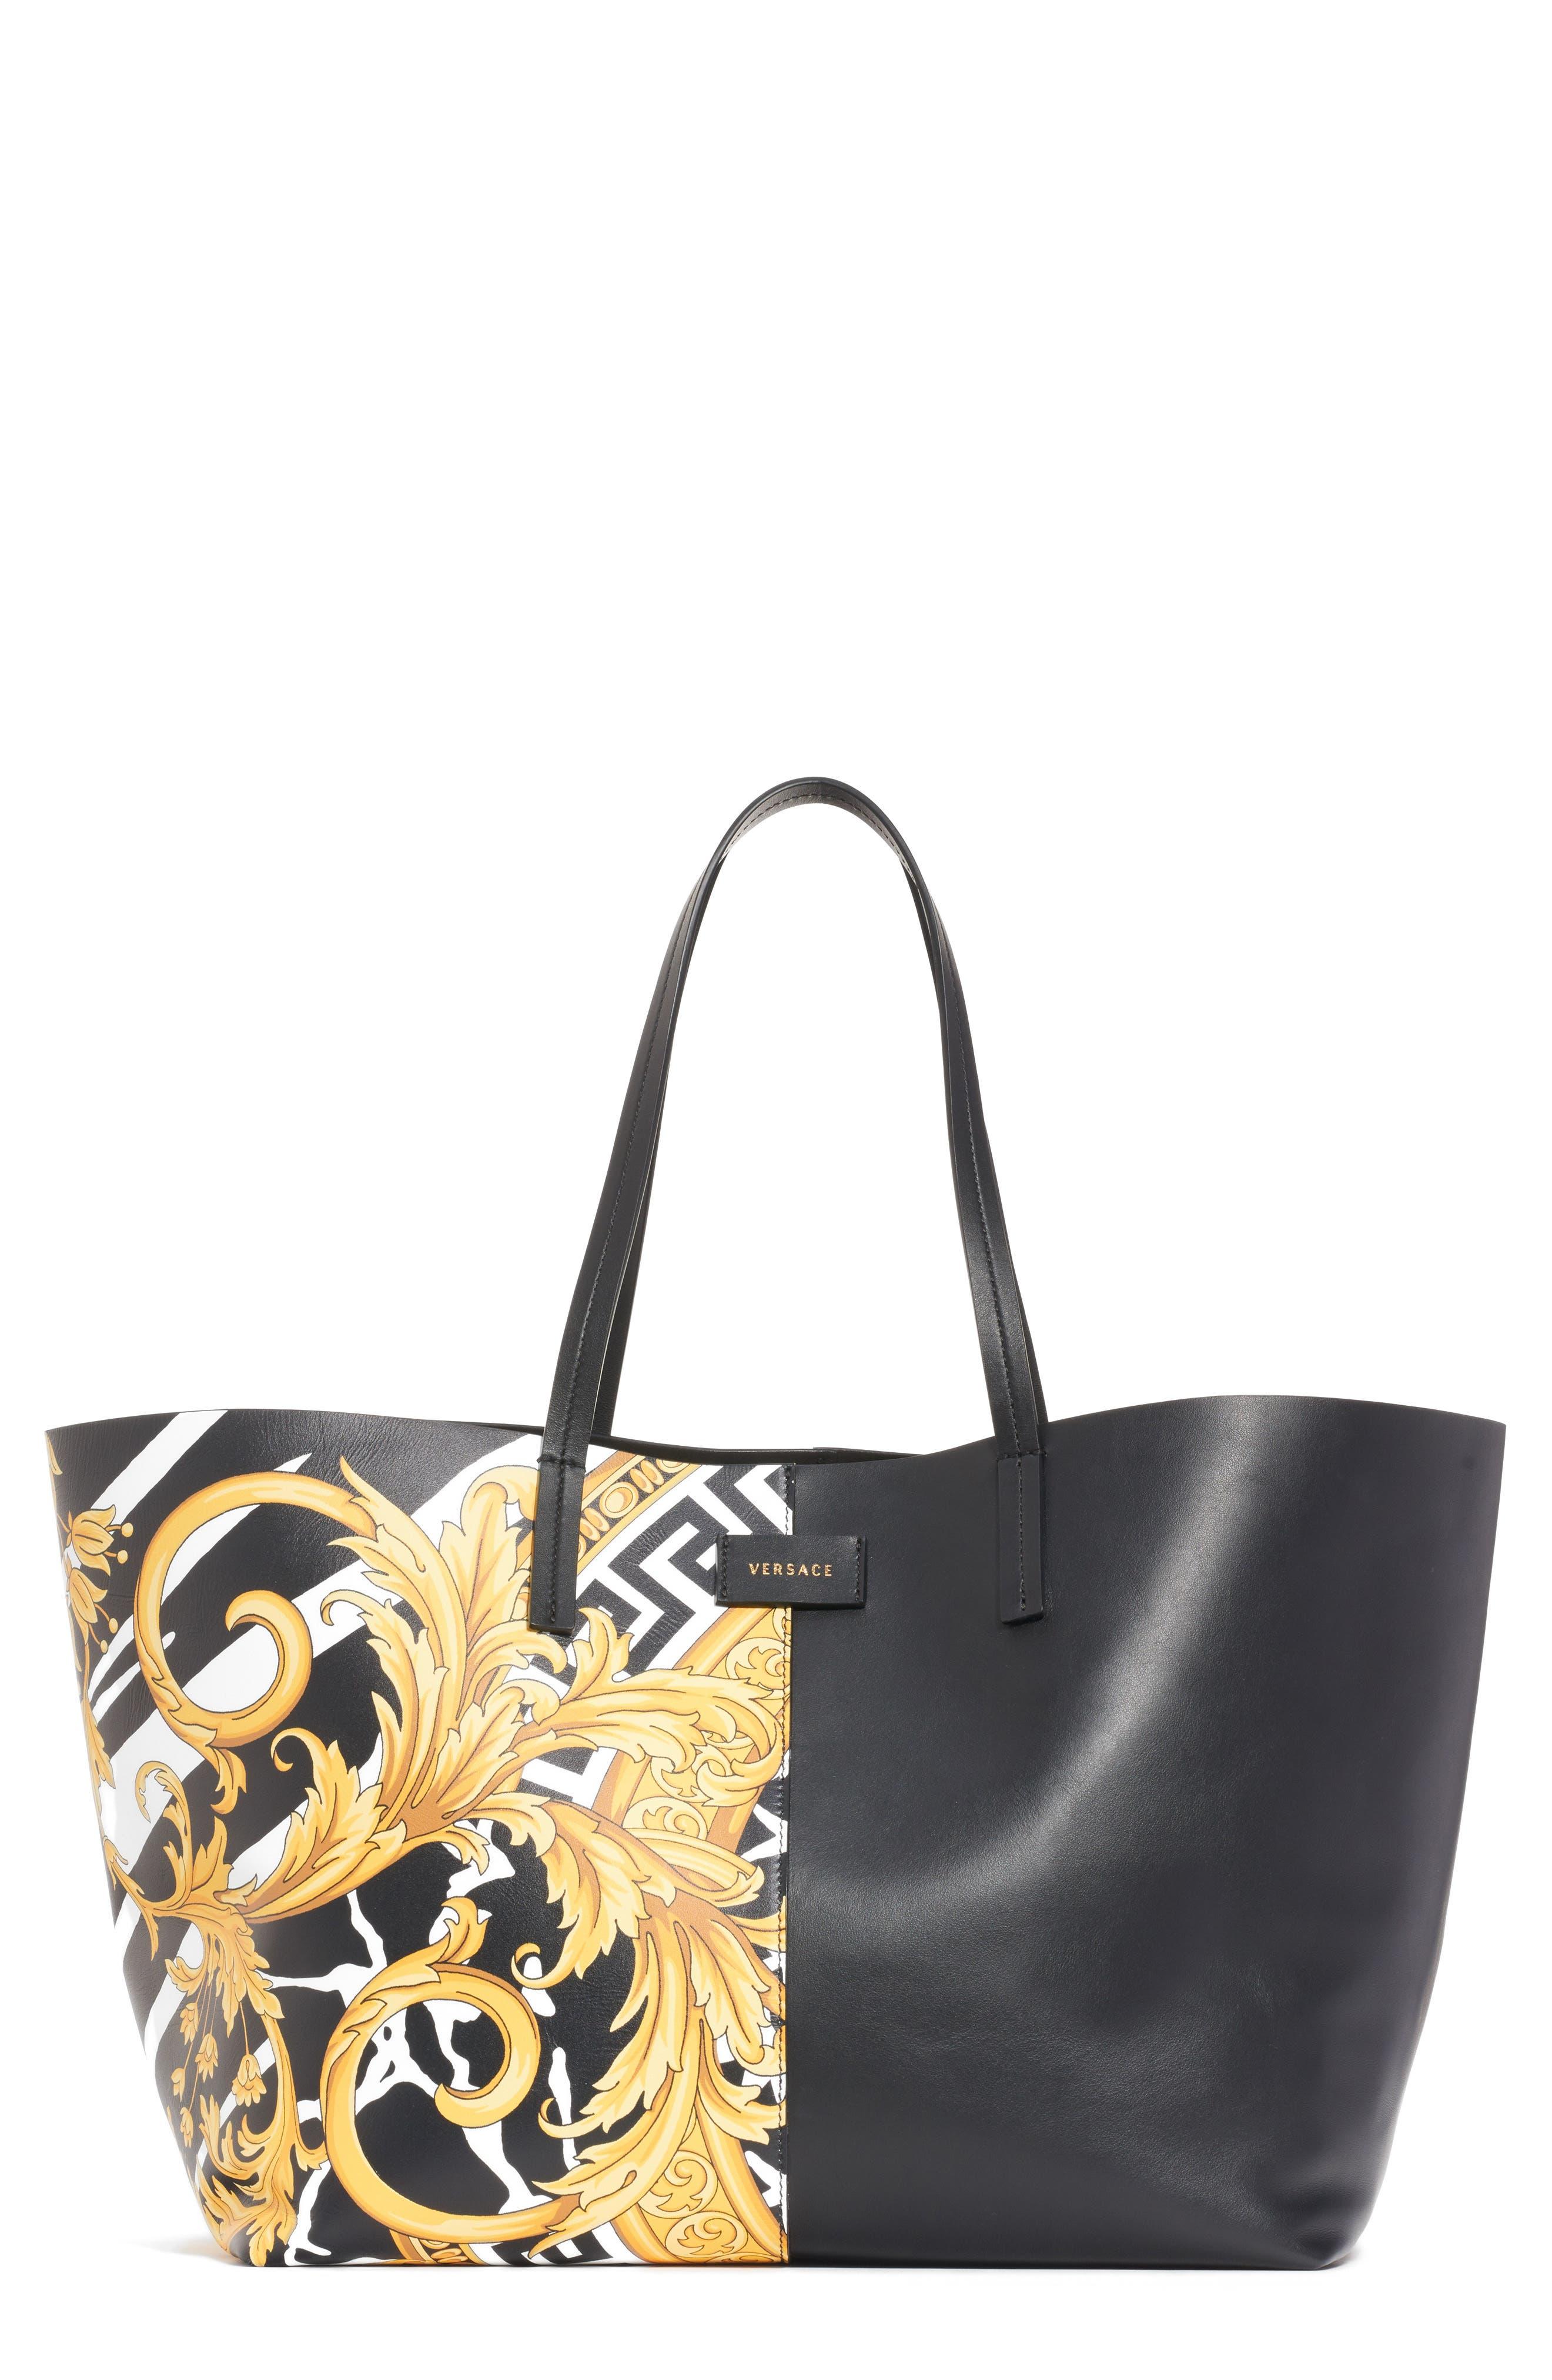 ddf5c5c4ad Women's Versace Designer Handbags & Wallets | Nordstrom